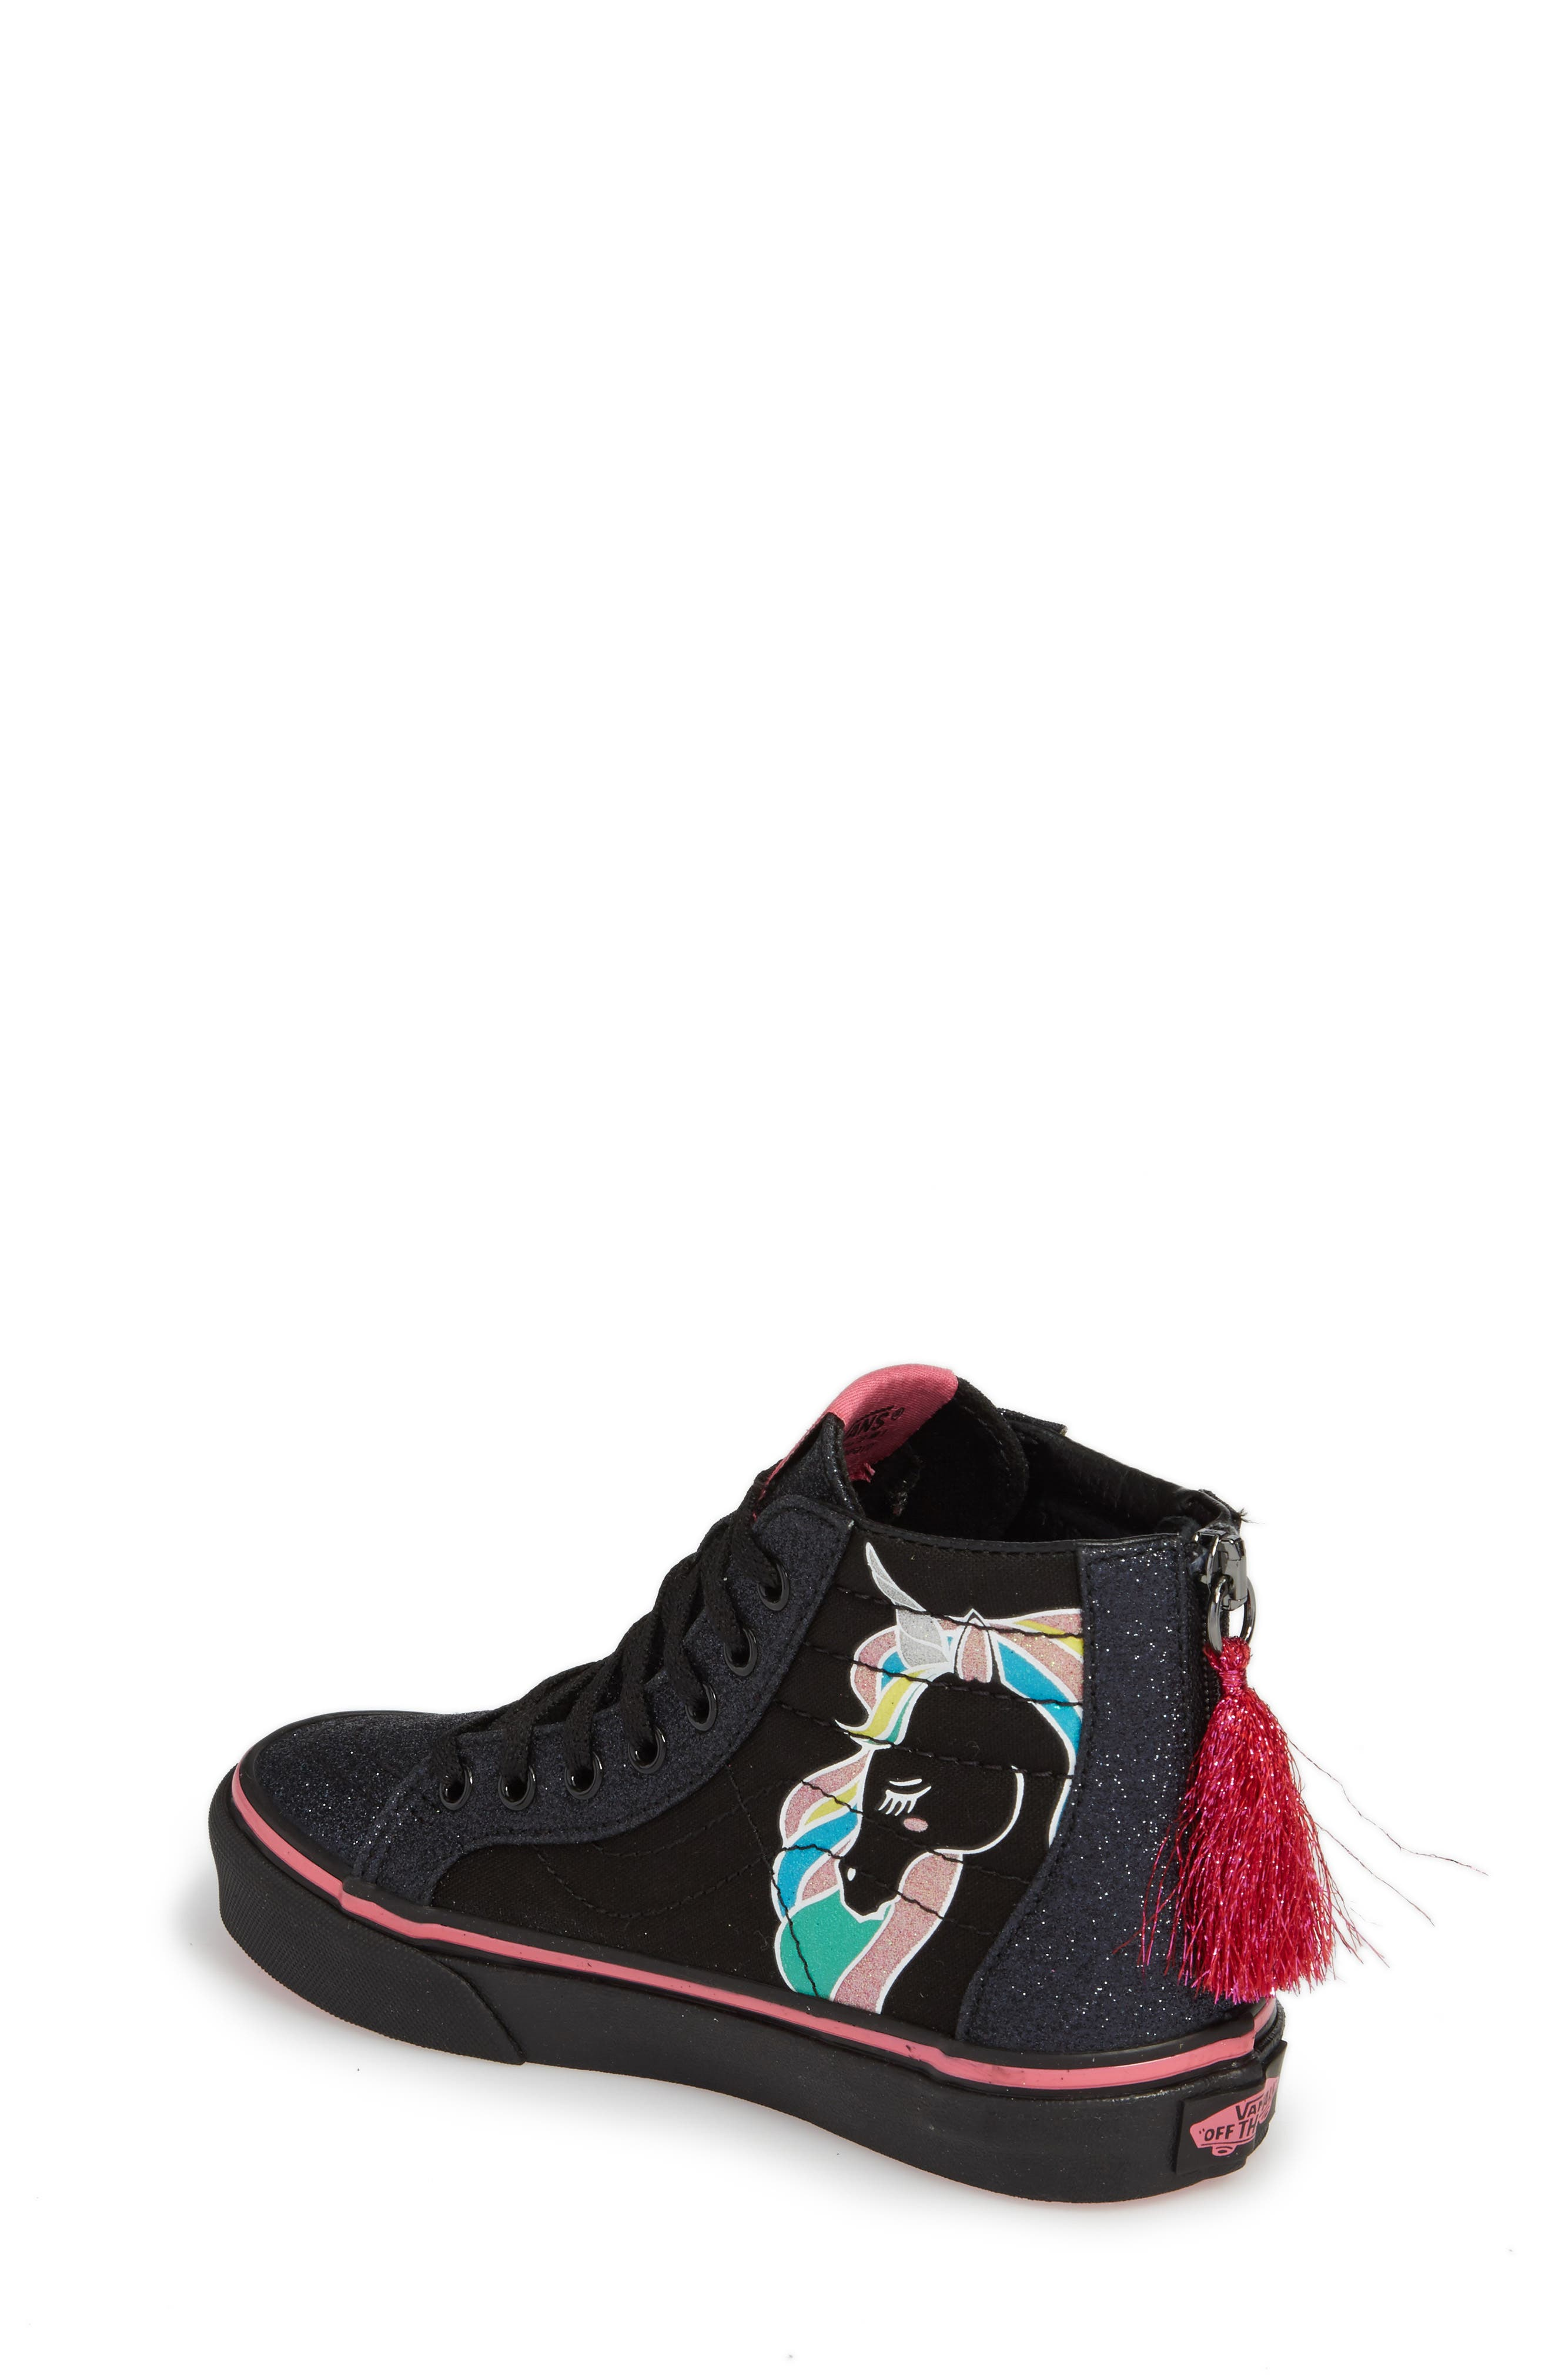 Alternate Image 2  - Vans Sk8-Hi Zip Unicorn Glitter High Top Sneaker (Baby, Walker, Toddler, Little Kid & Big Kid)